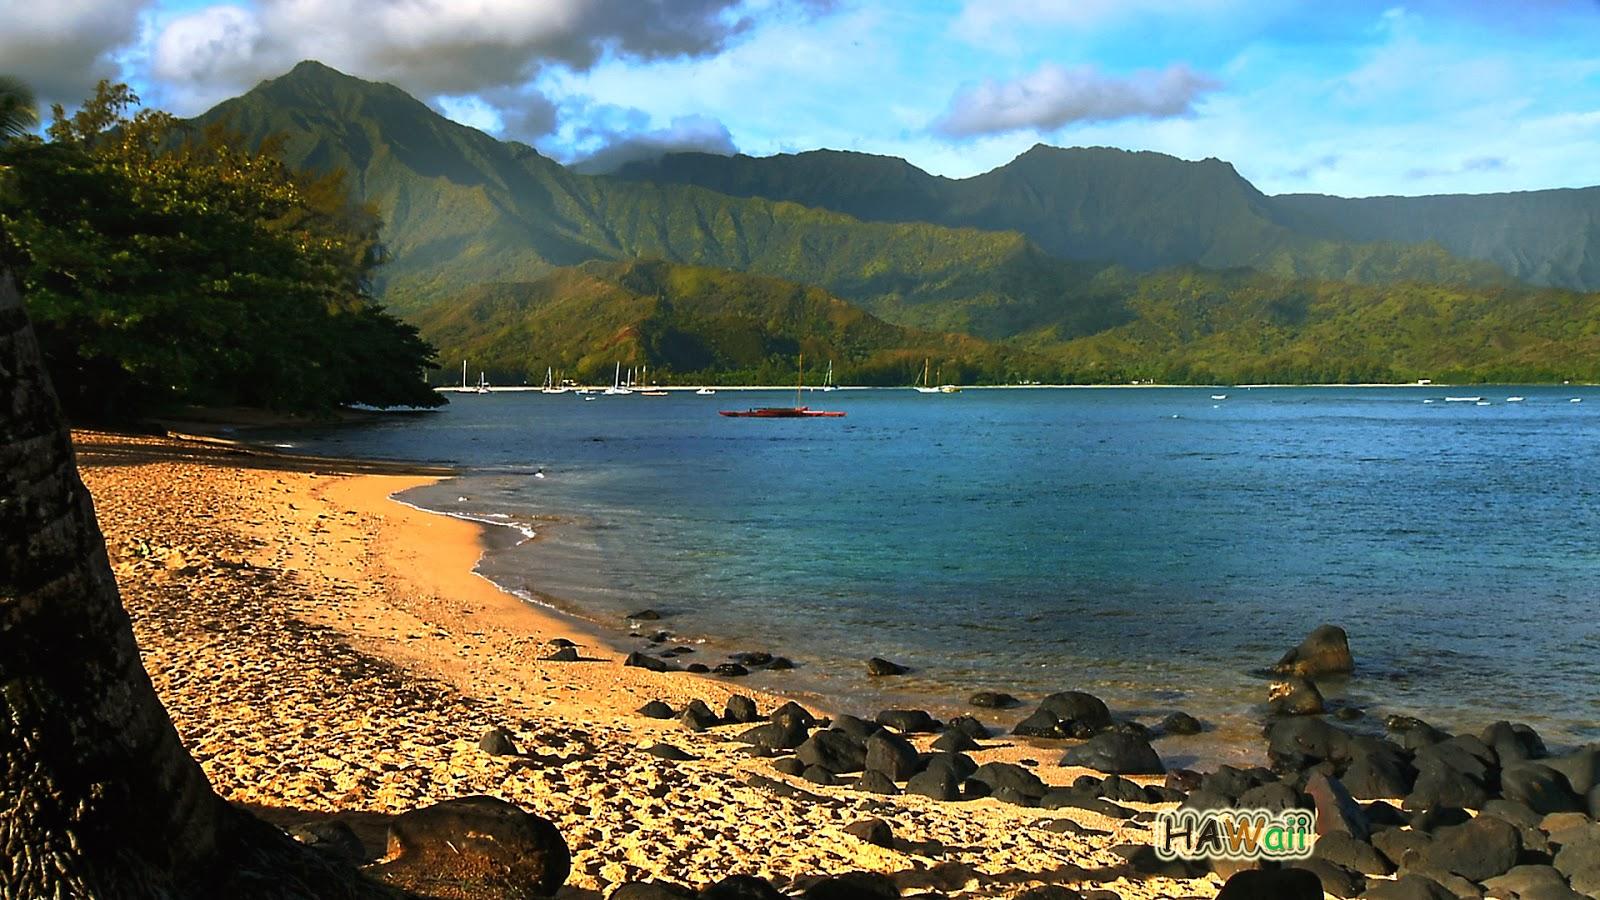 hawaii hawaiian island desktop nature beach middle sea ocean beauty beaches natural views islands gadgets place